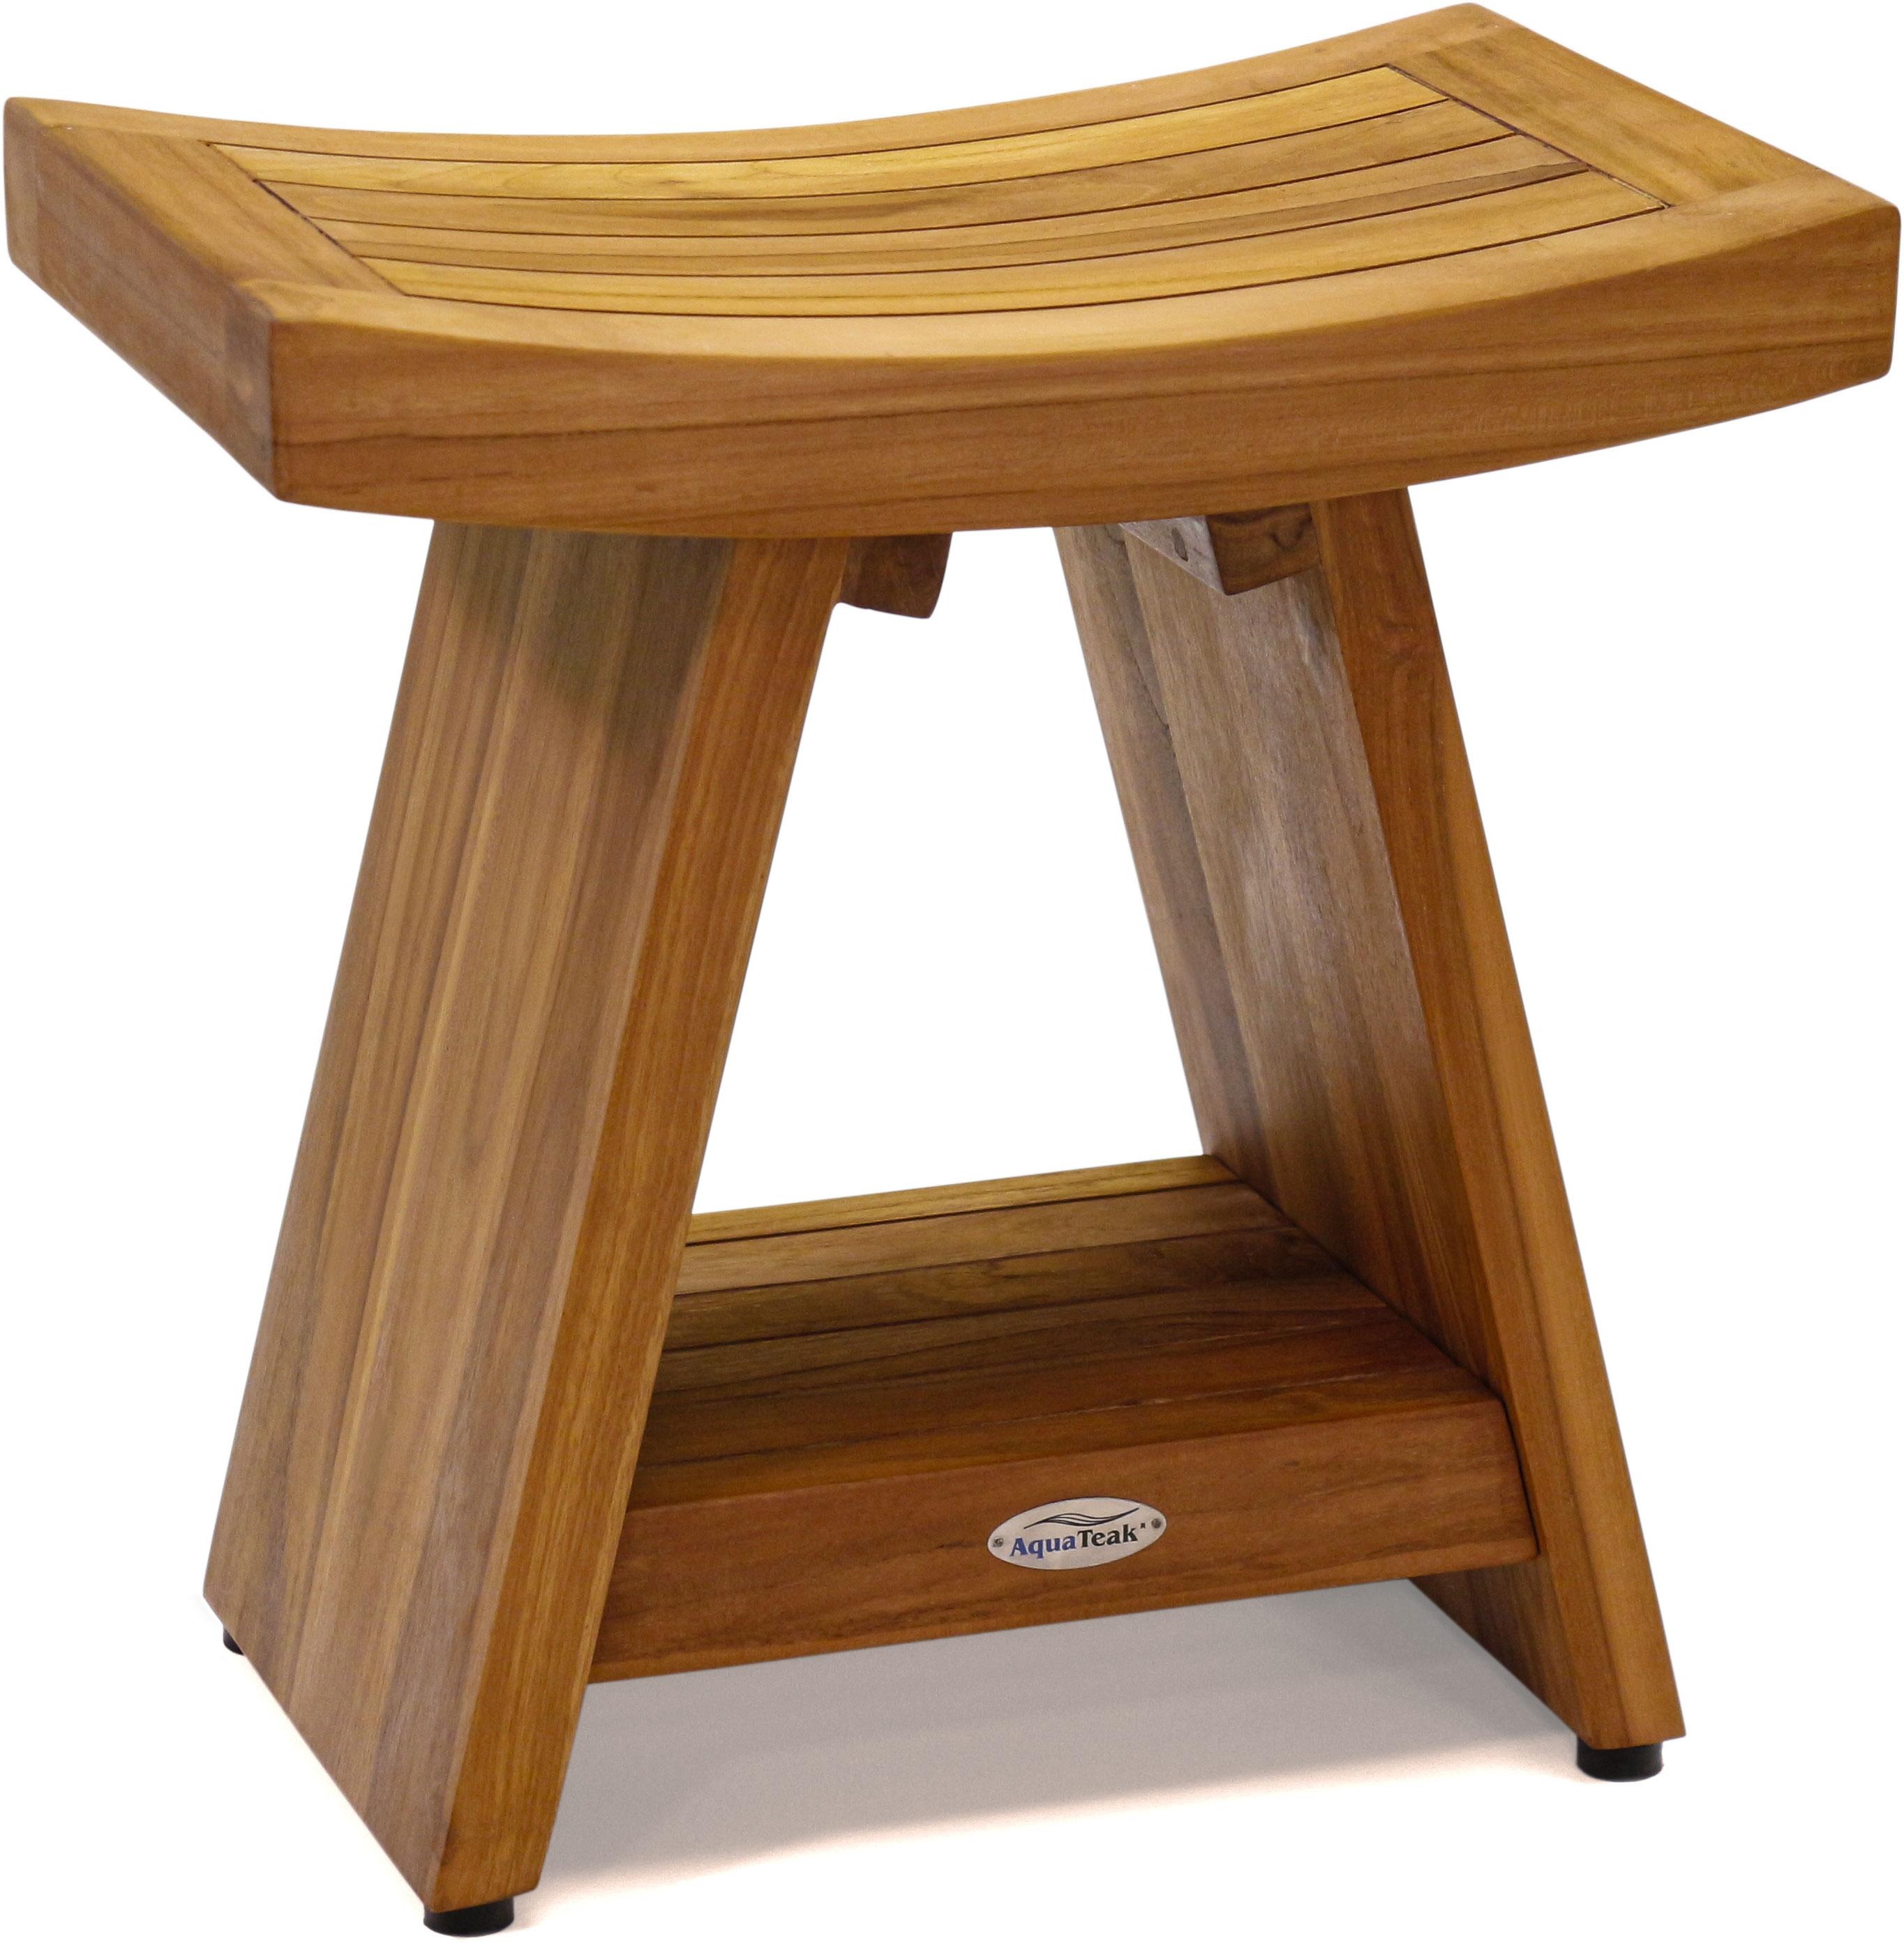 18 Asia Teak Shower Bench With Shelf Modern Teak Seating I Aquateak